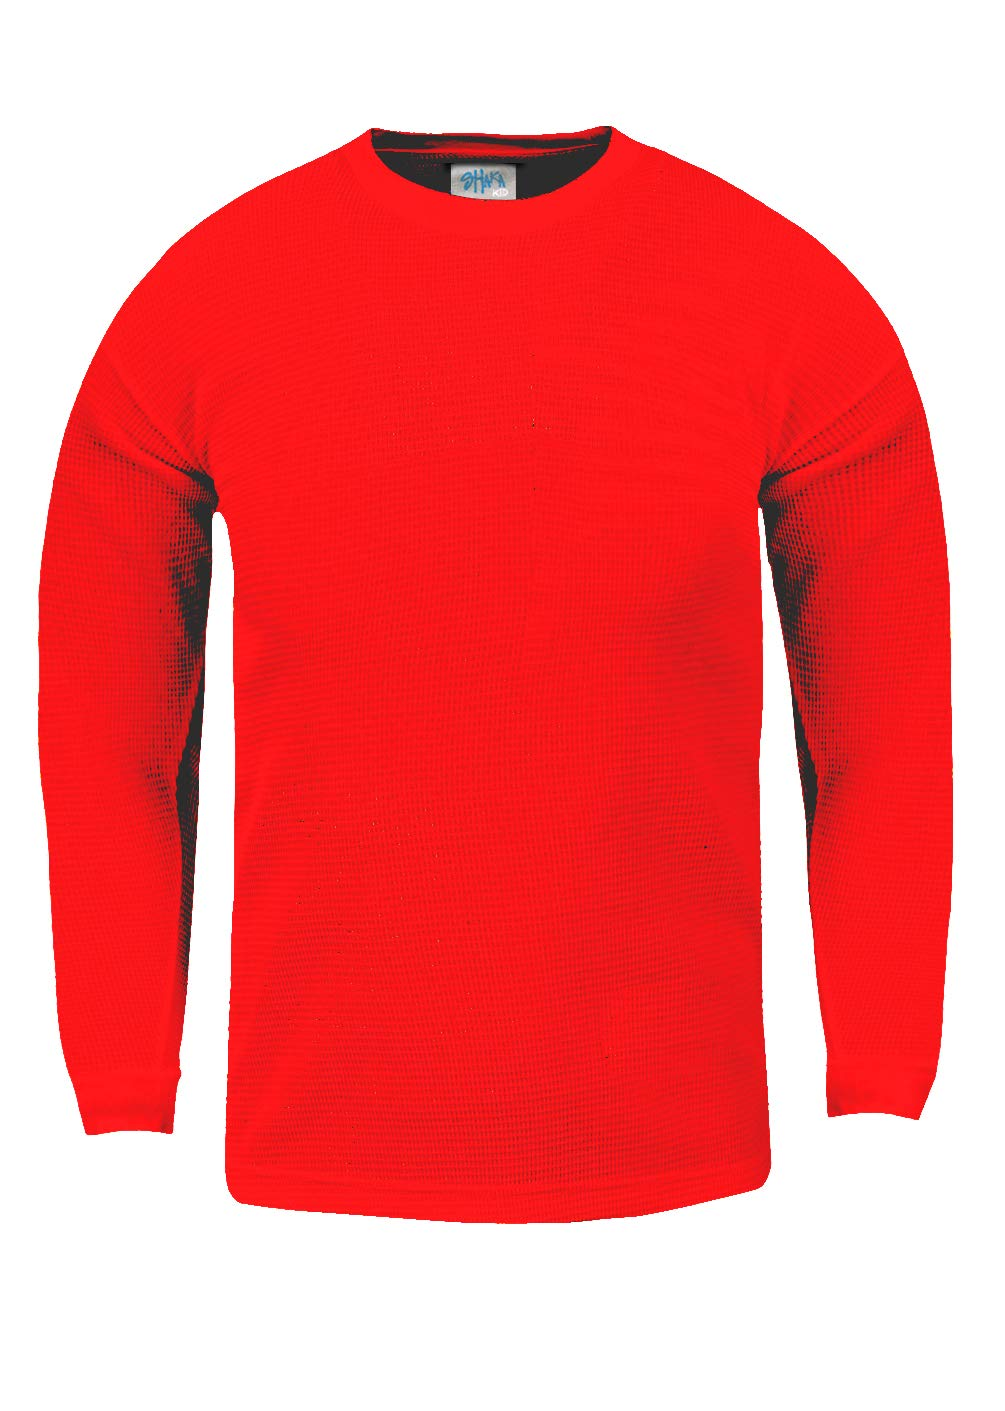 Shaka Wear KTC10_S Thermal Long Sleeve Crewneck Waffle Shirt Red S by Shaka Wear